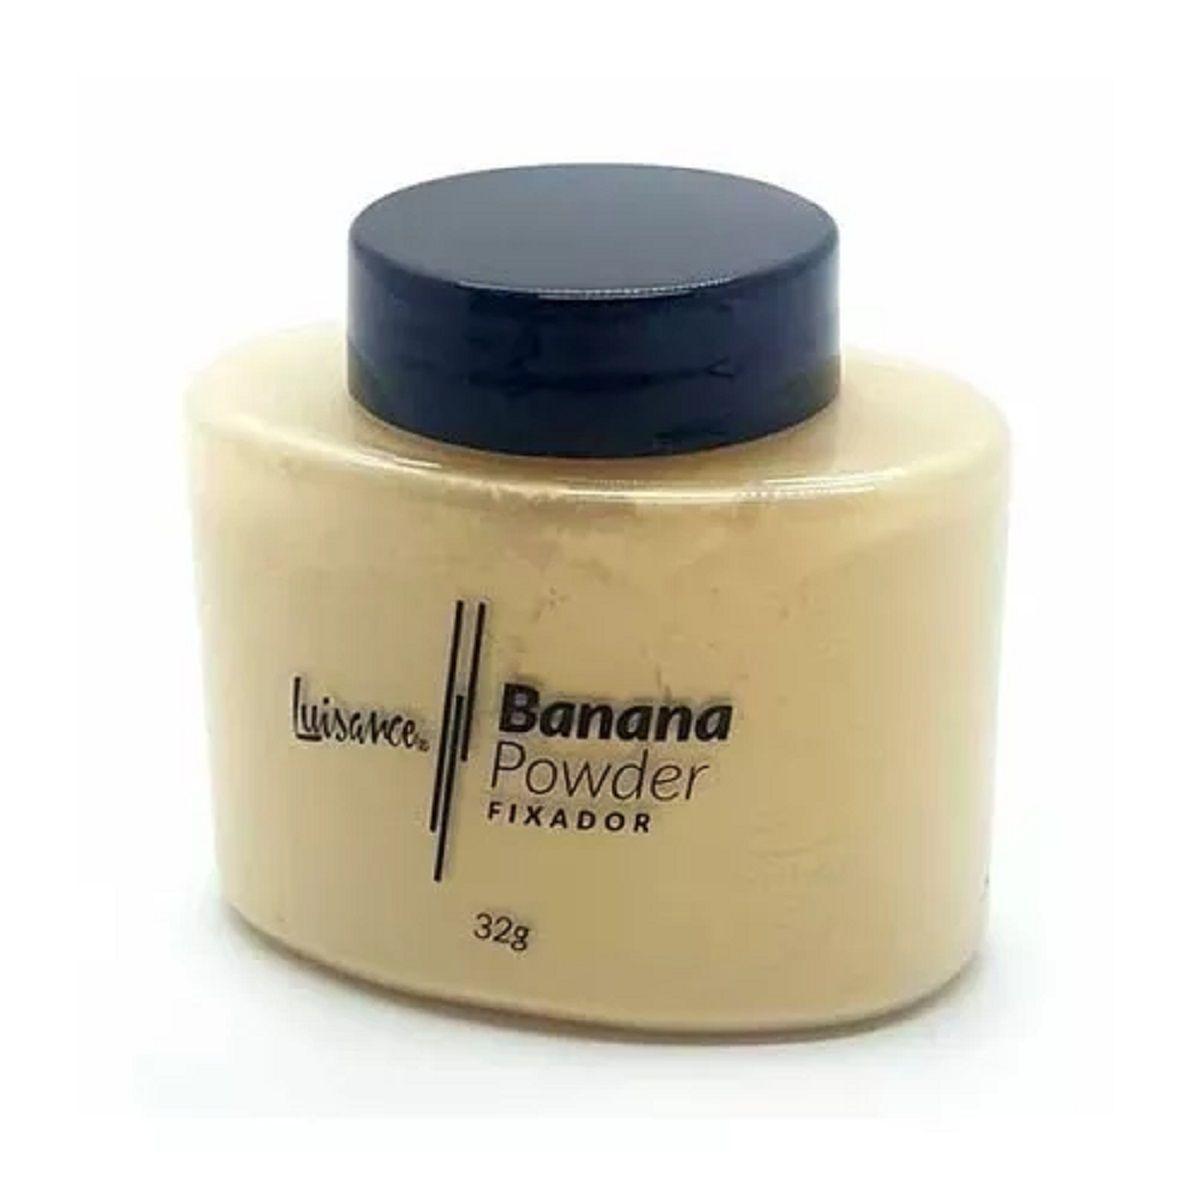 Pó Banana Powder Luisance L9013